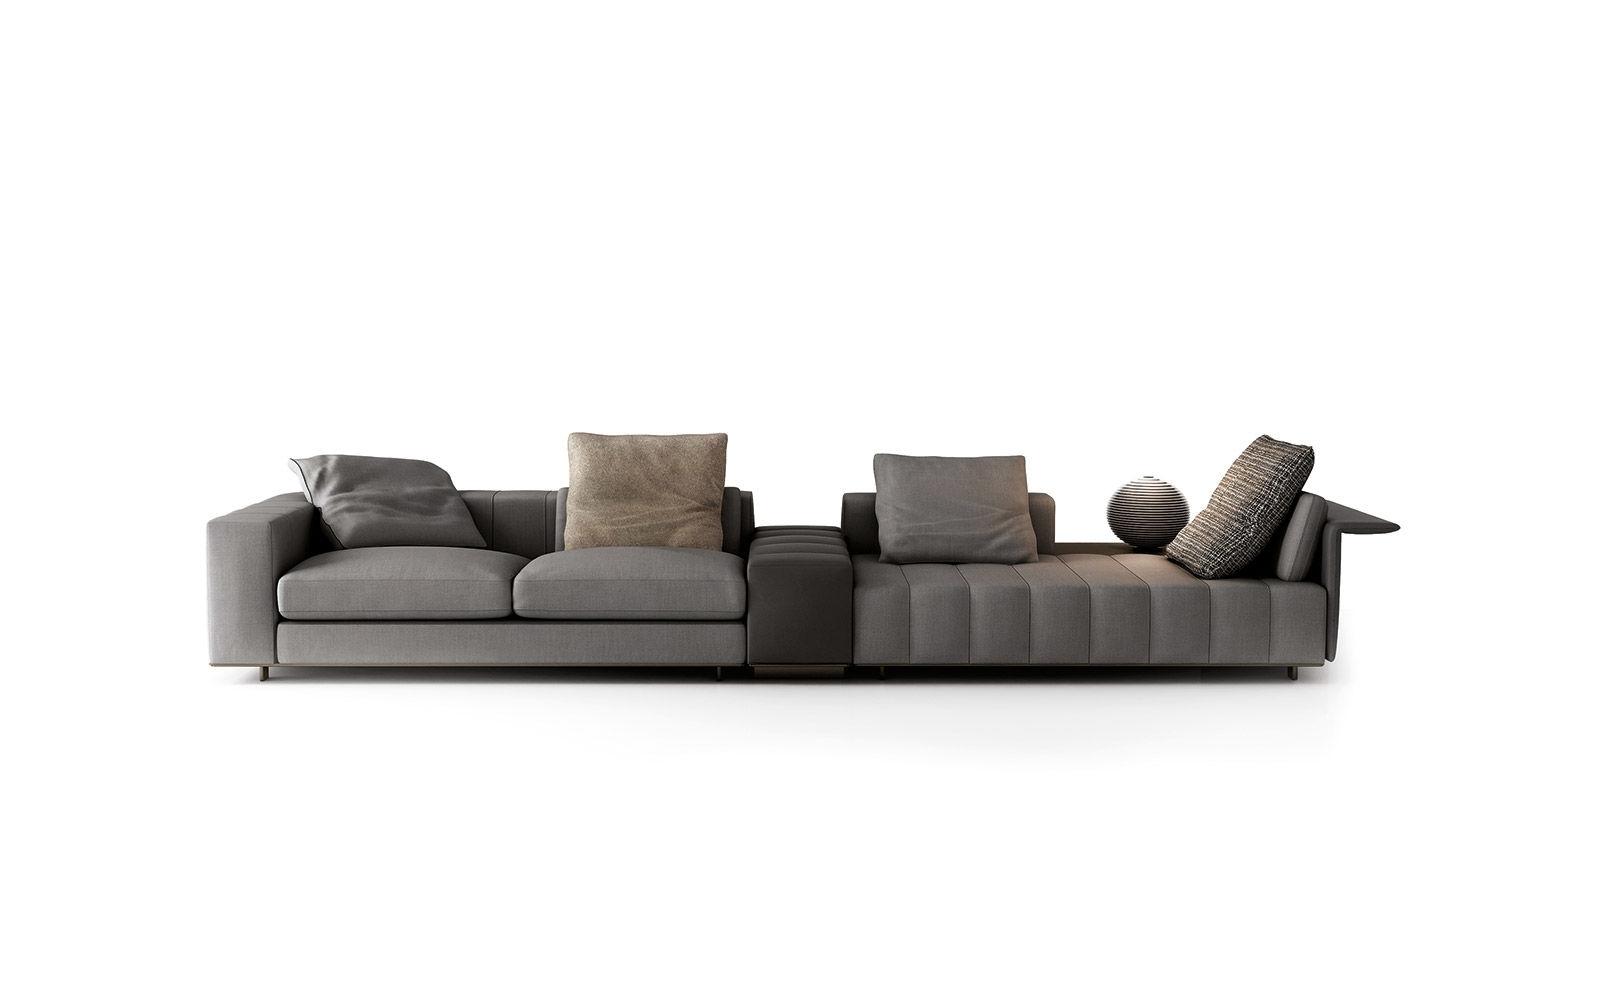 Freeman Seating System   Sofas – En Pertaining To Calder Grey 6 Piece Manual Reclining Sectionals (Image 13 of 25)